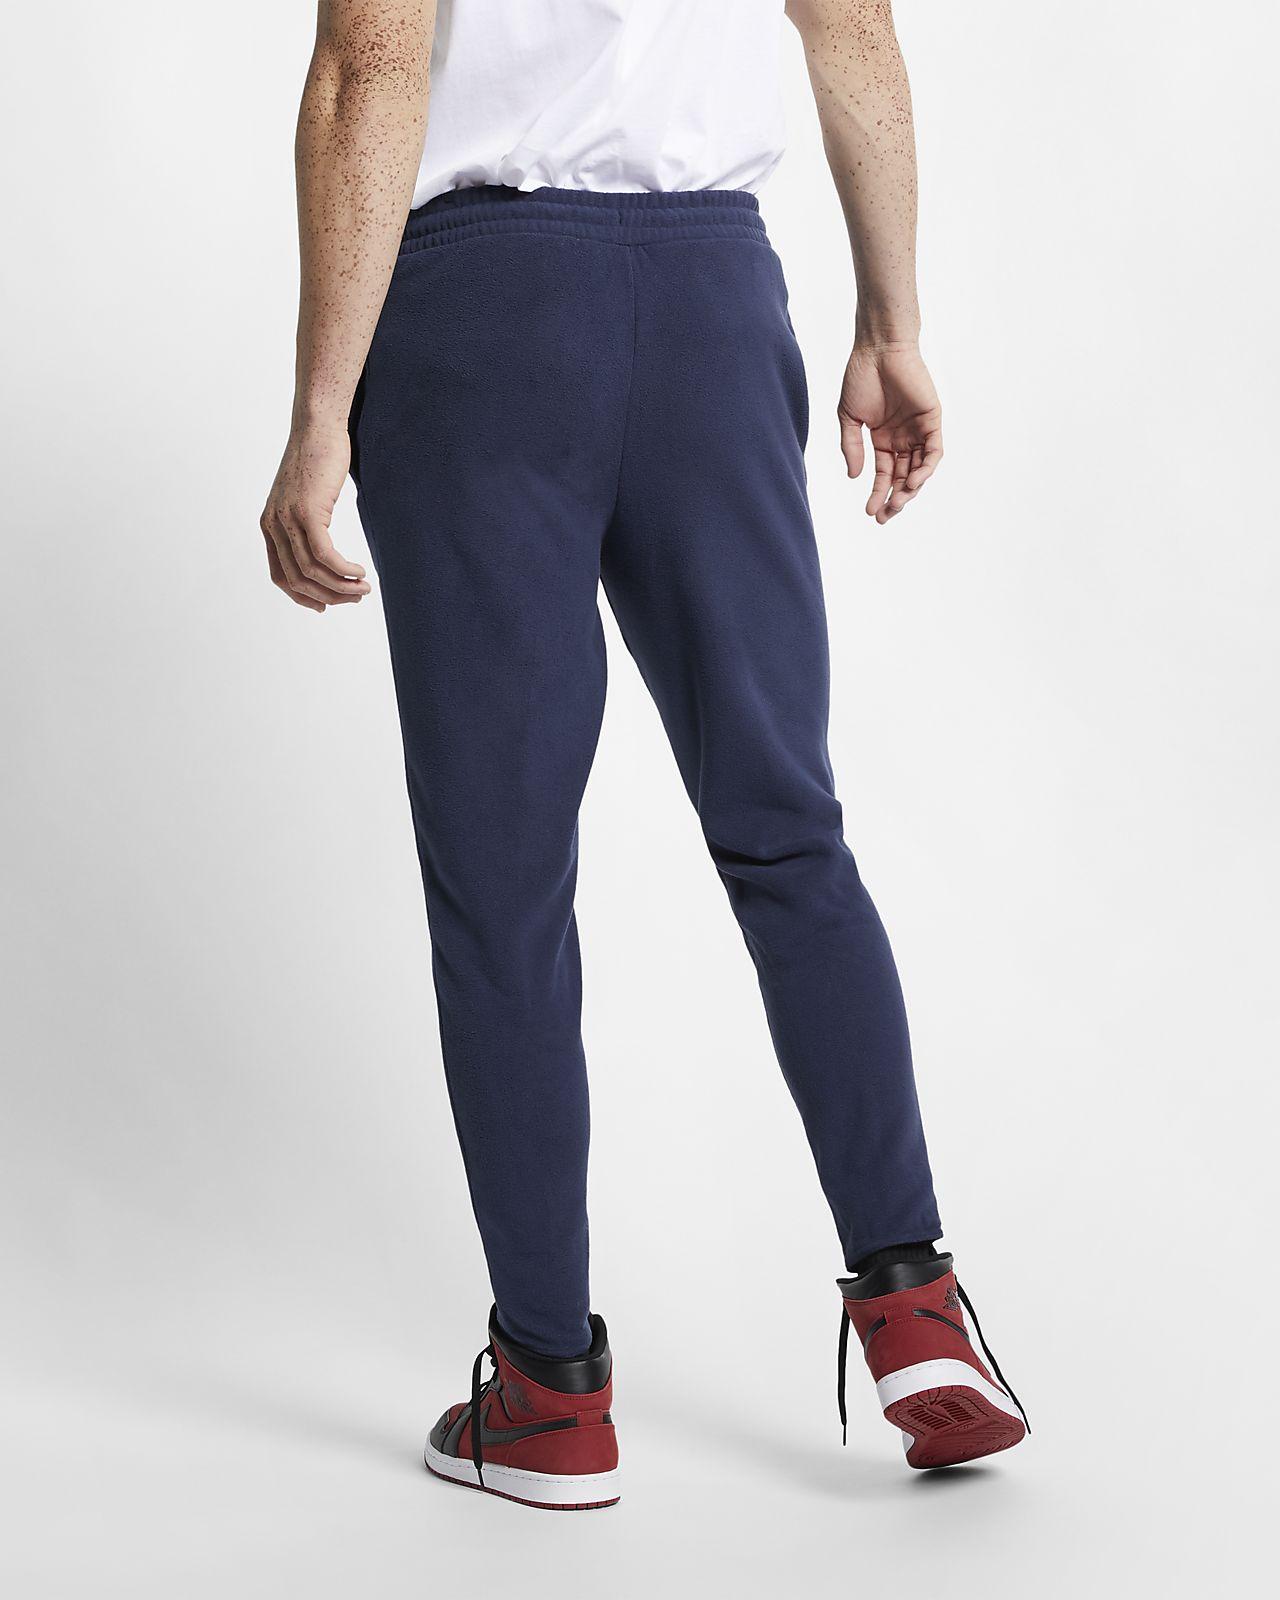 f9c23f8bb3eb43 Jordan Therma 23 Alpha Men s Training Trousers. Nike.com NO